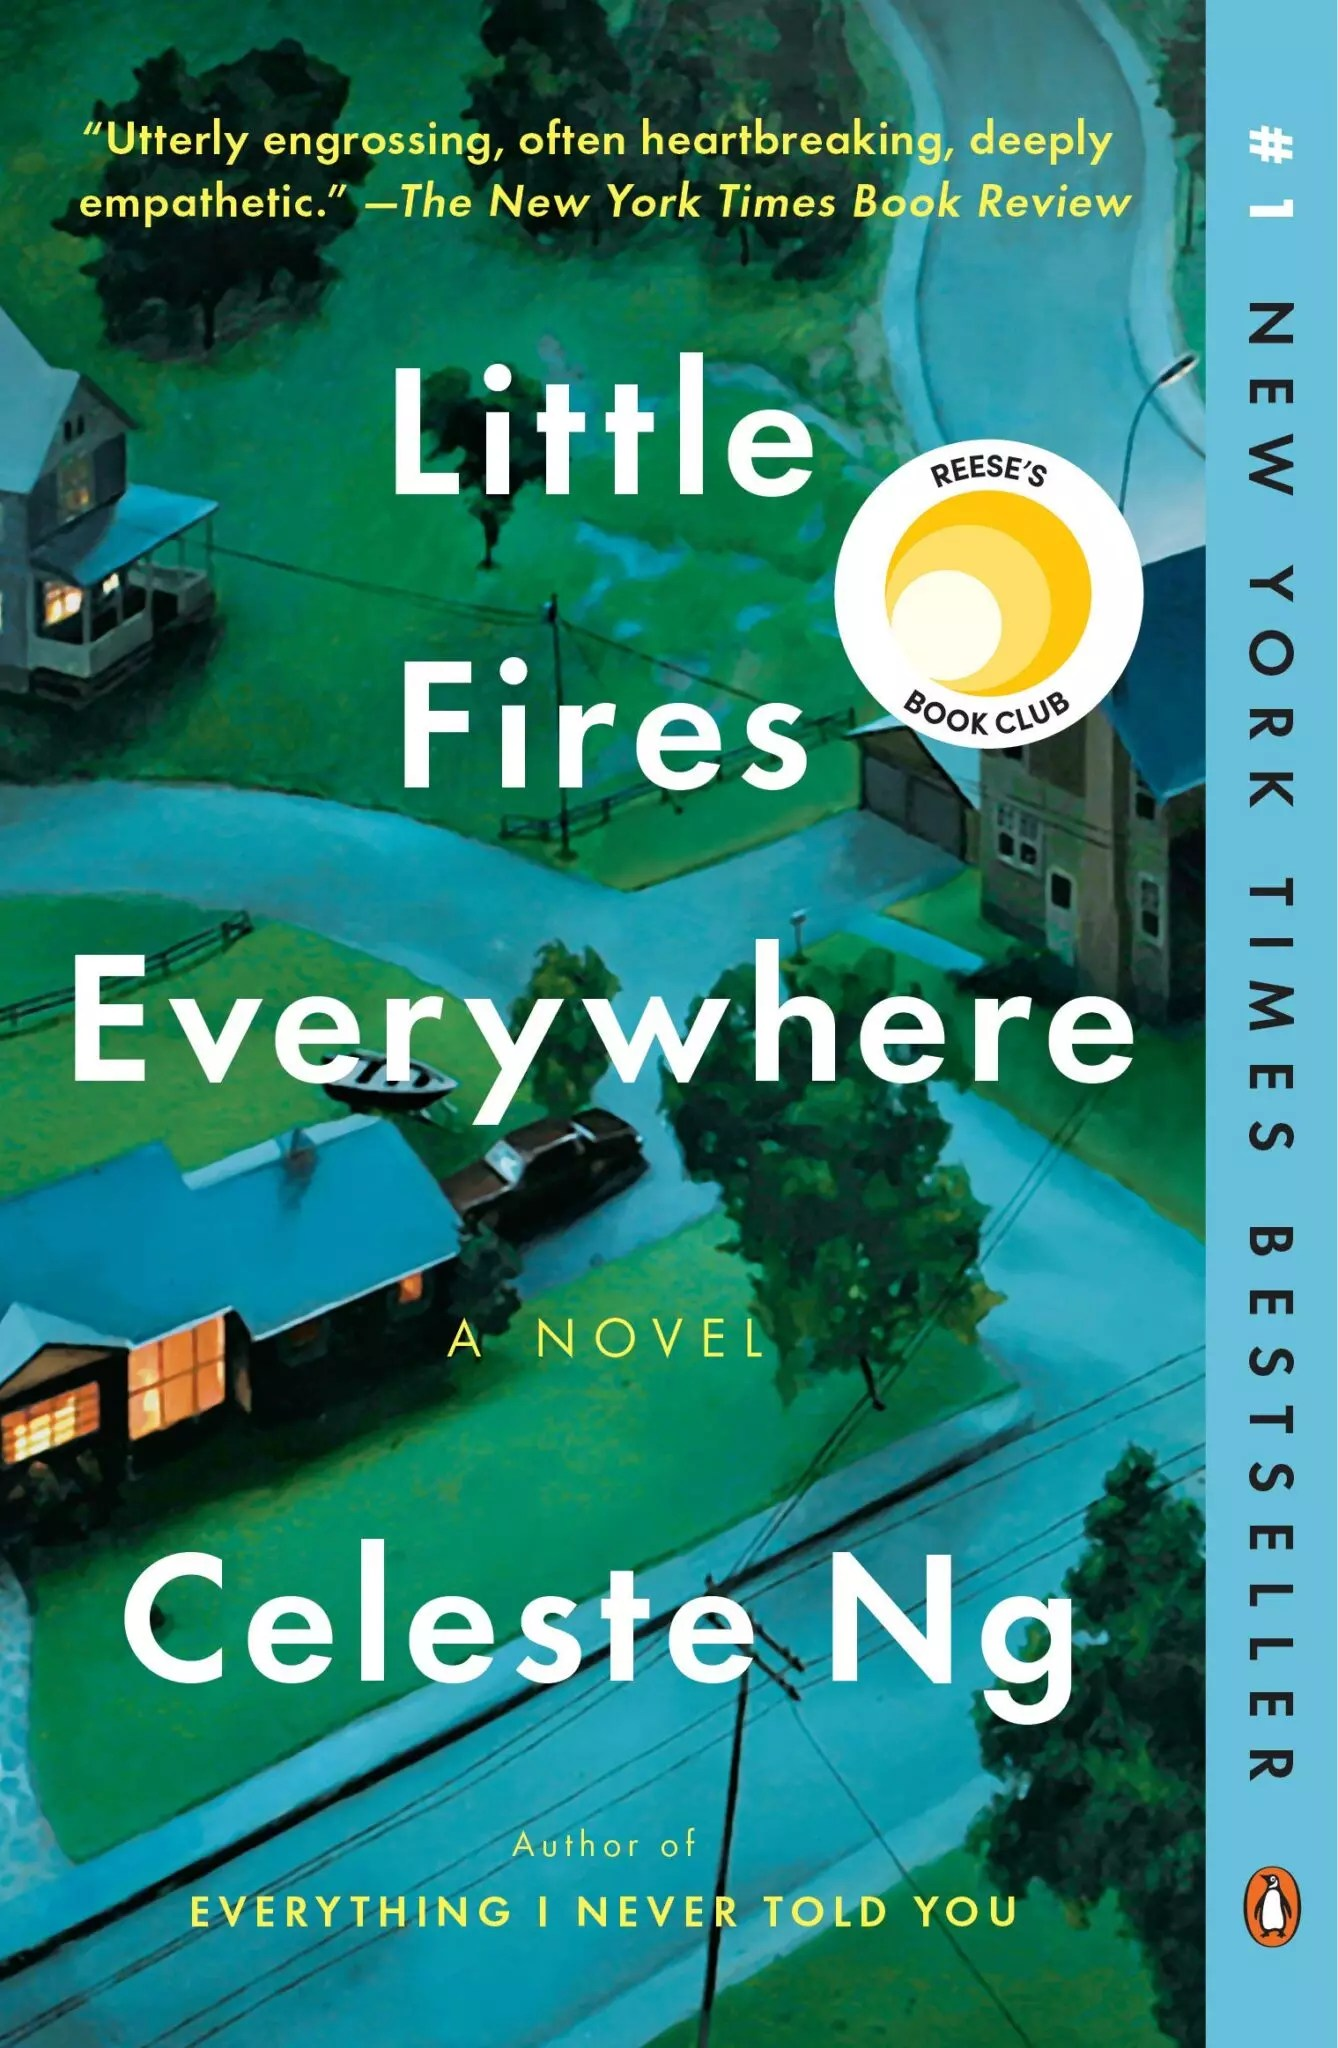 little fires everywhere celeste ng PB cover